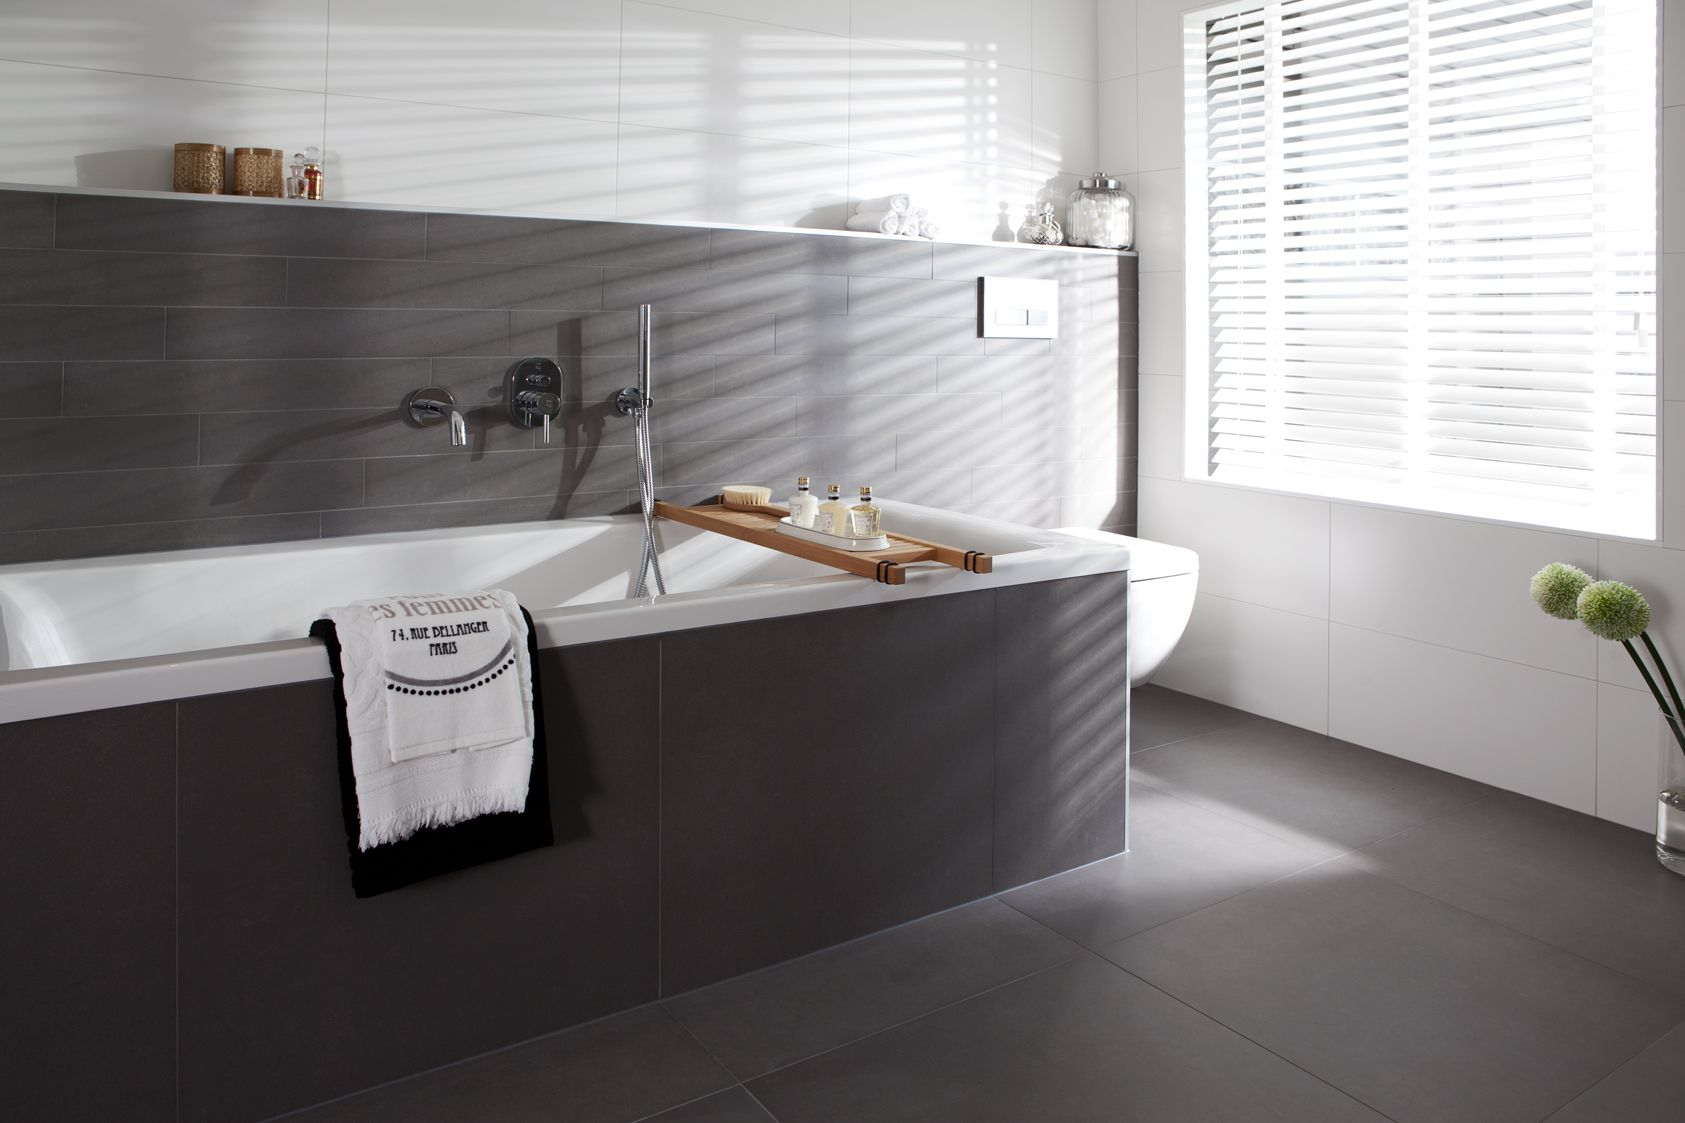 Kosten Badkamer Baderie : Dit duo ligbad van het baderie huismerk met de afmeting 180x80 cm